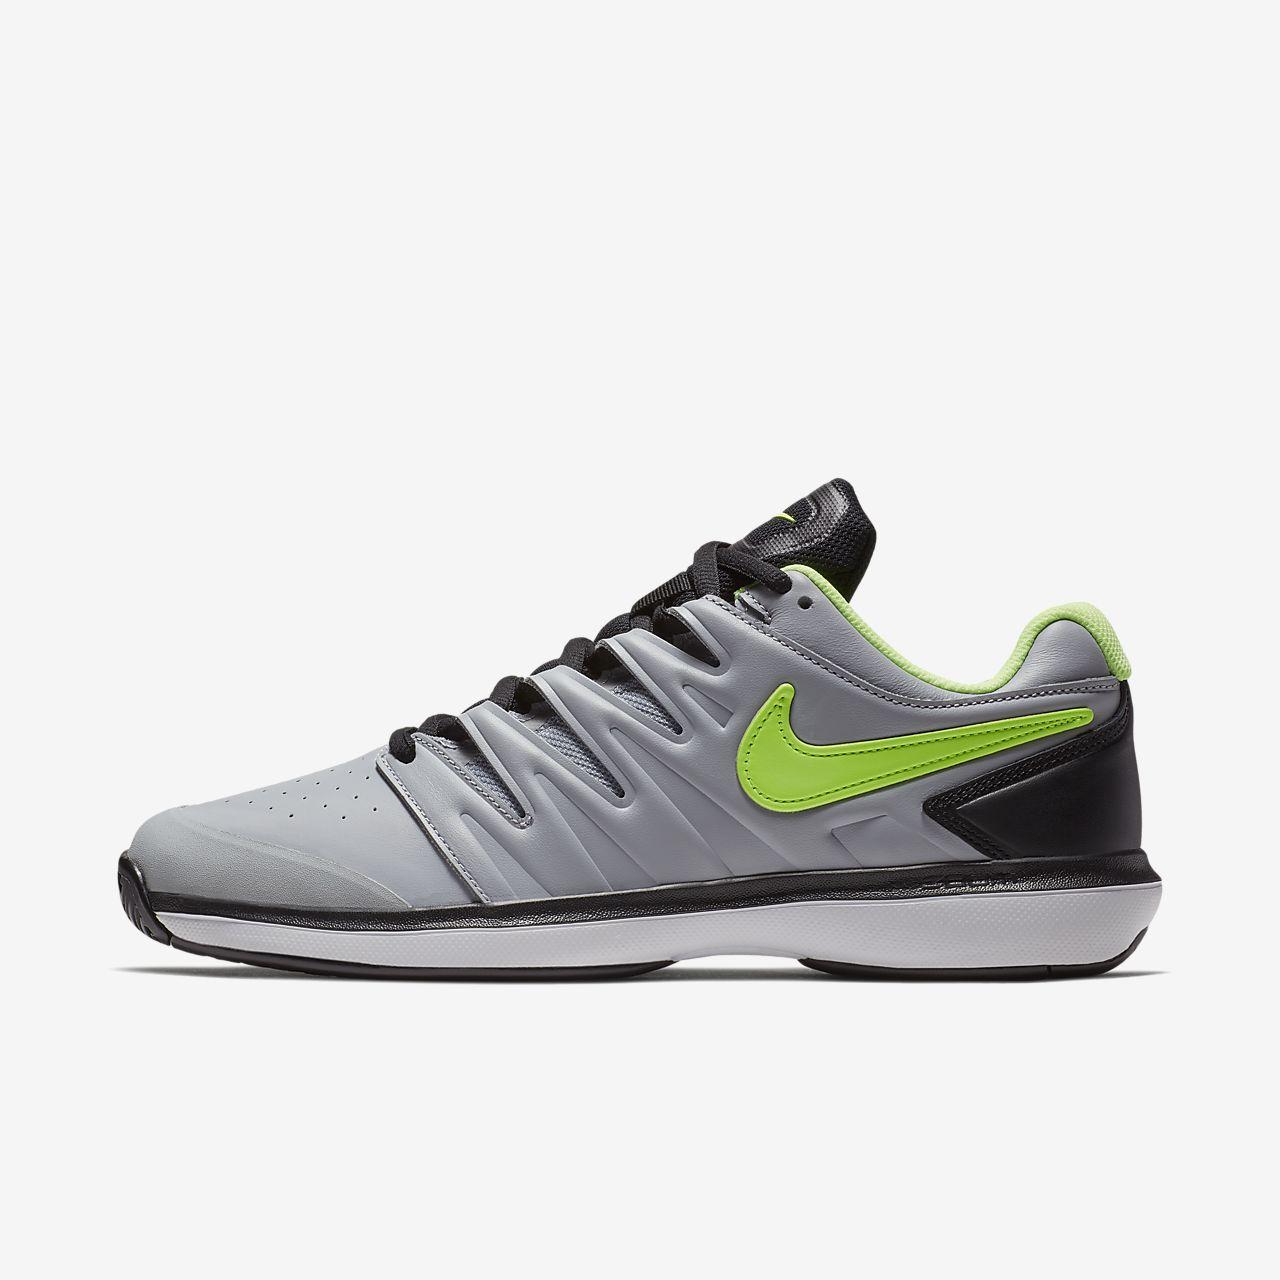 ... Nike Air Zoom Prestige Leather HC Men's Tennis Shoe